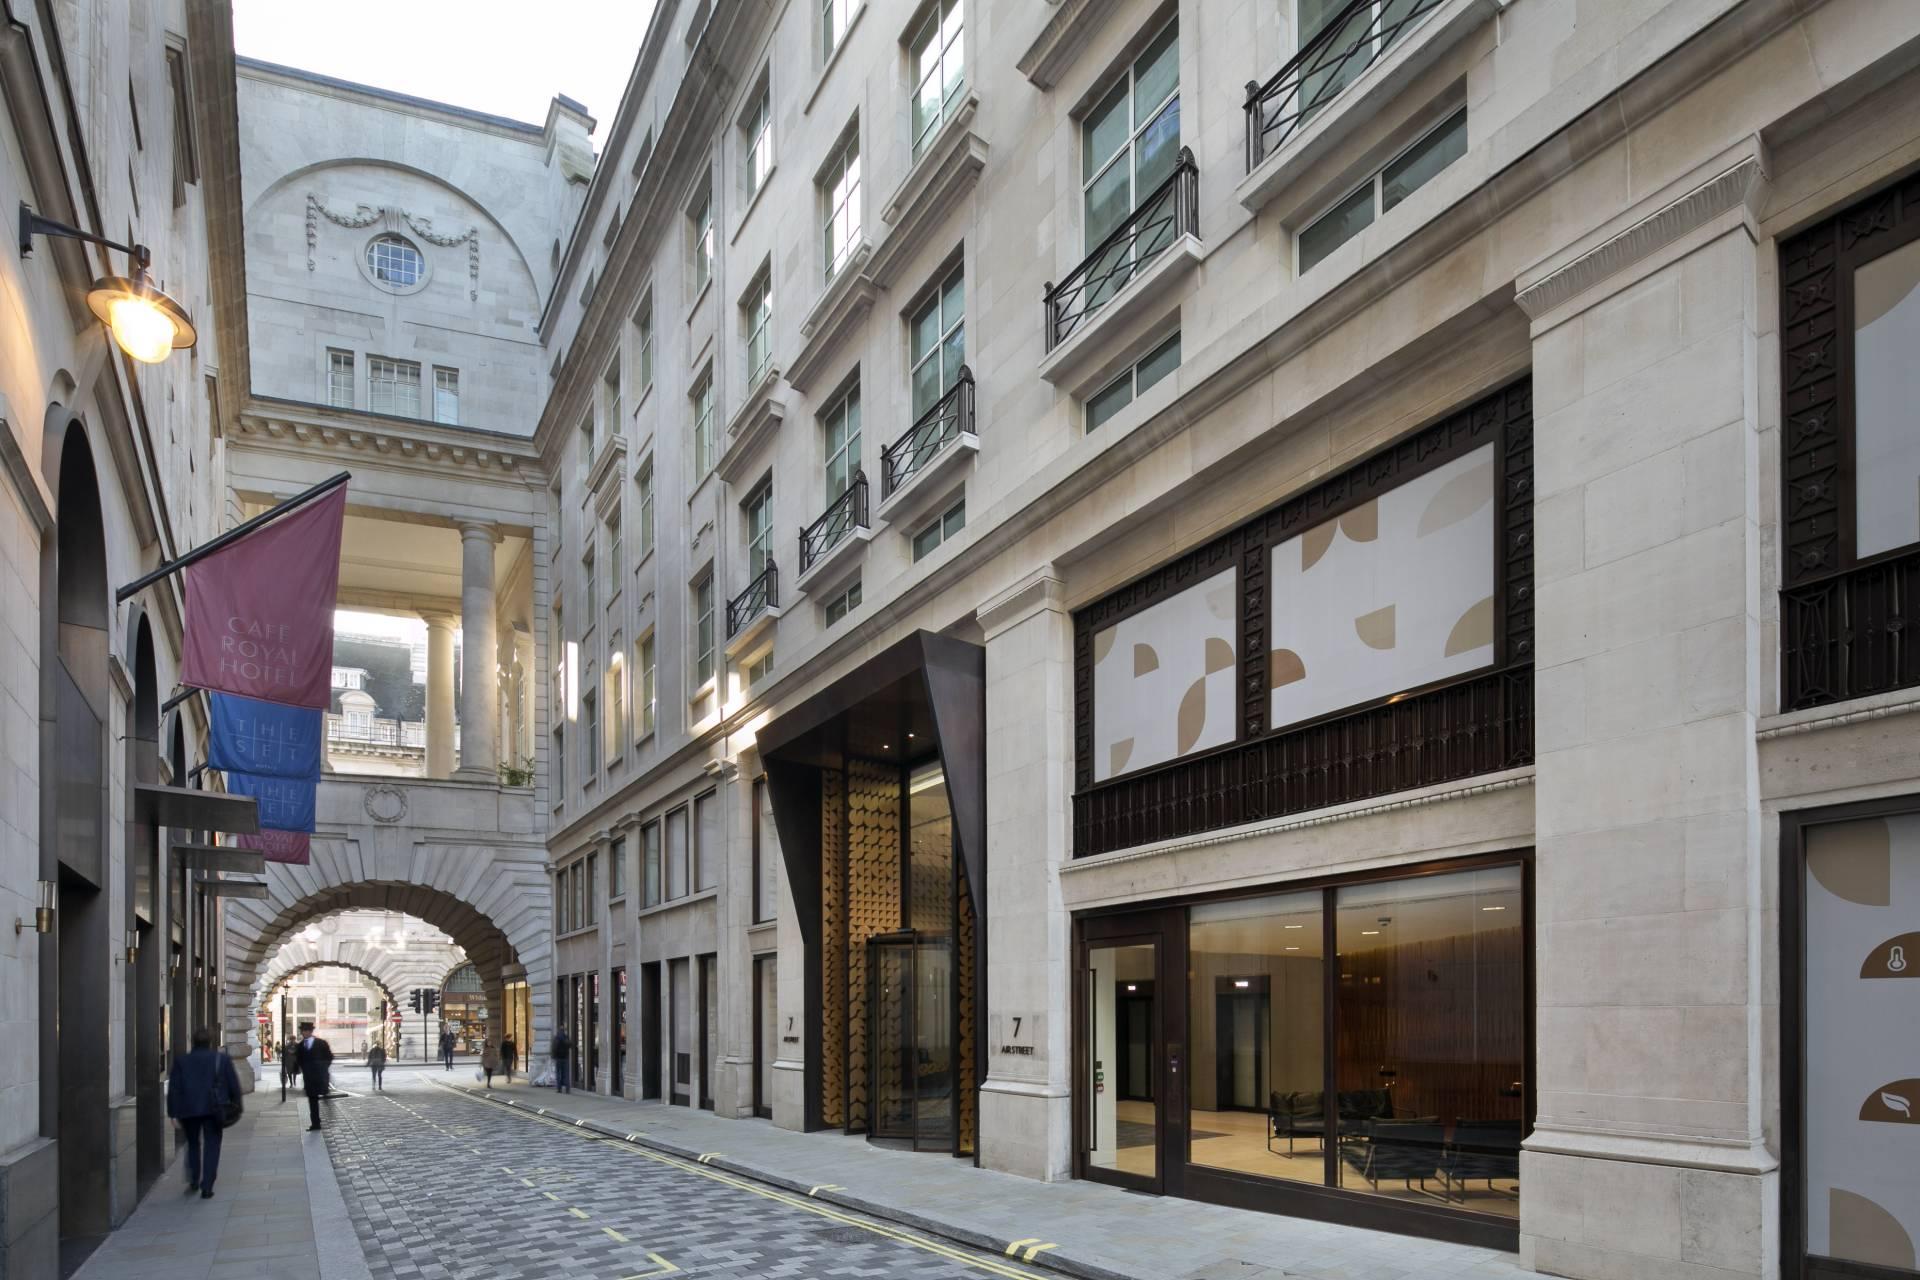 7 air street archway